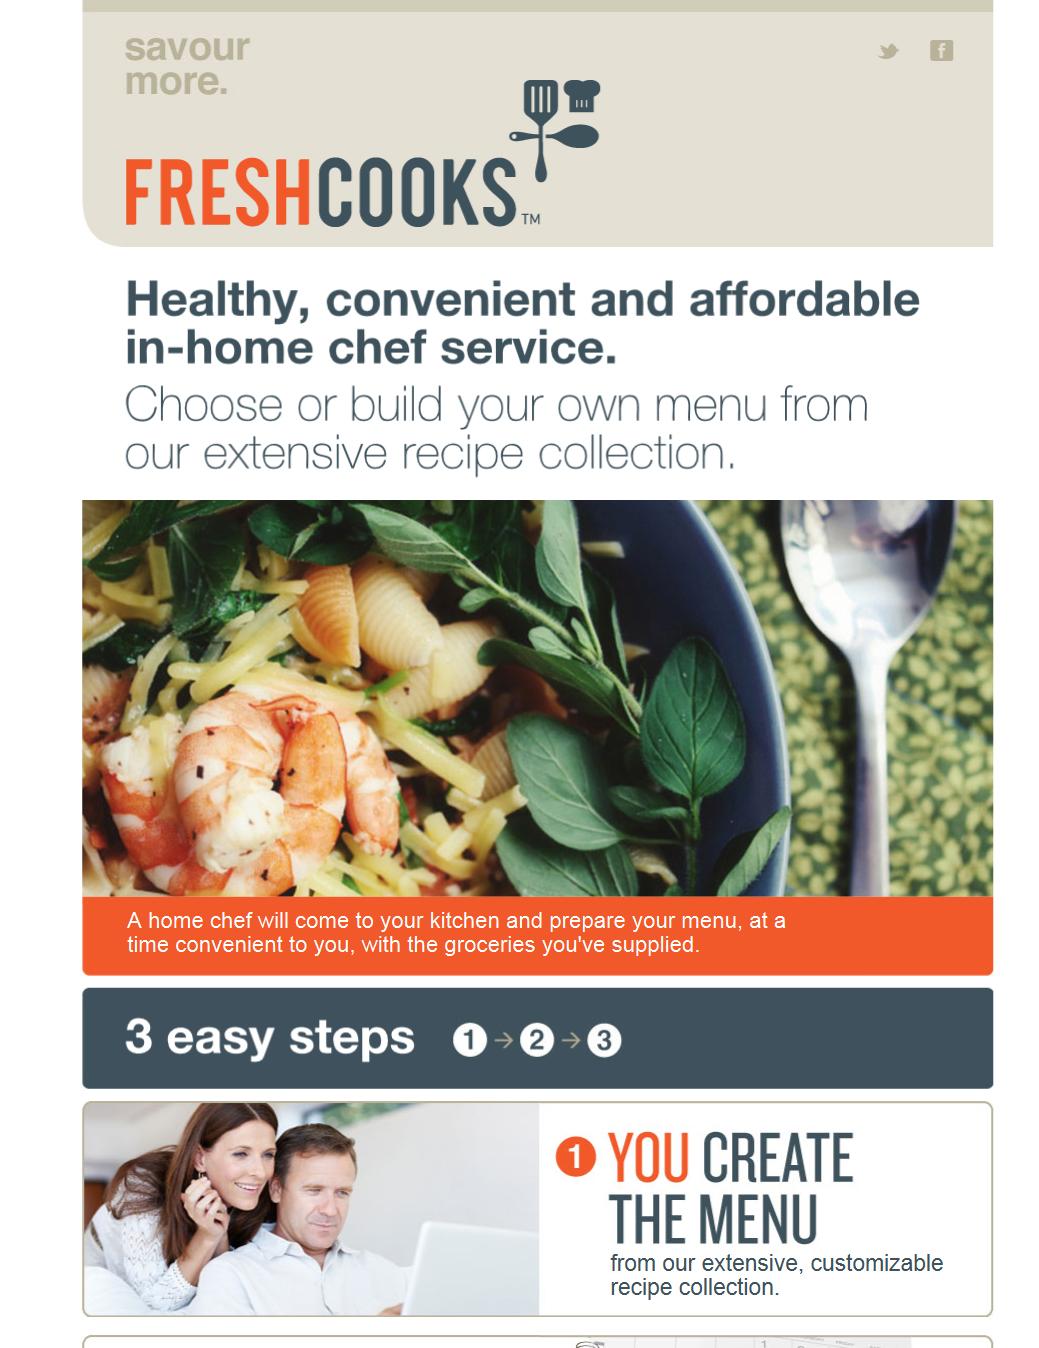 FreshCooks - In Home Chef Service 2012-11-25 20-17-52 copy.jpg